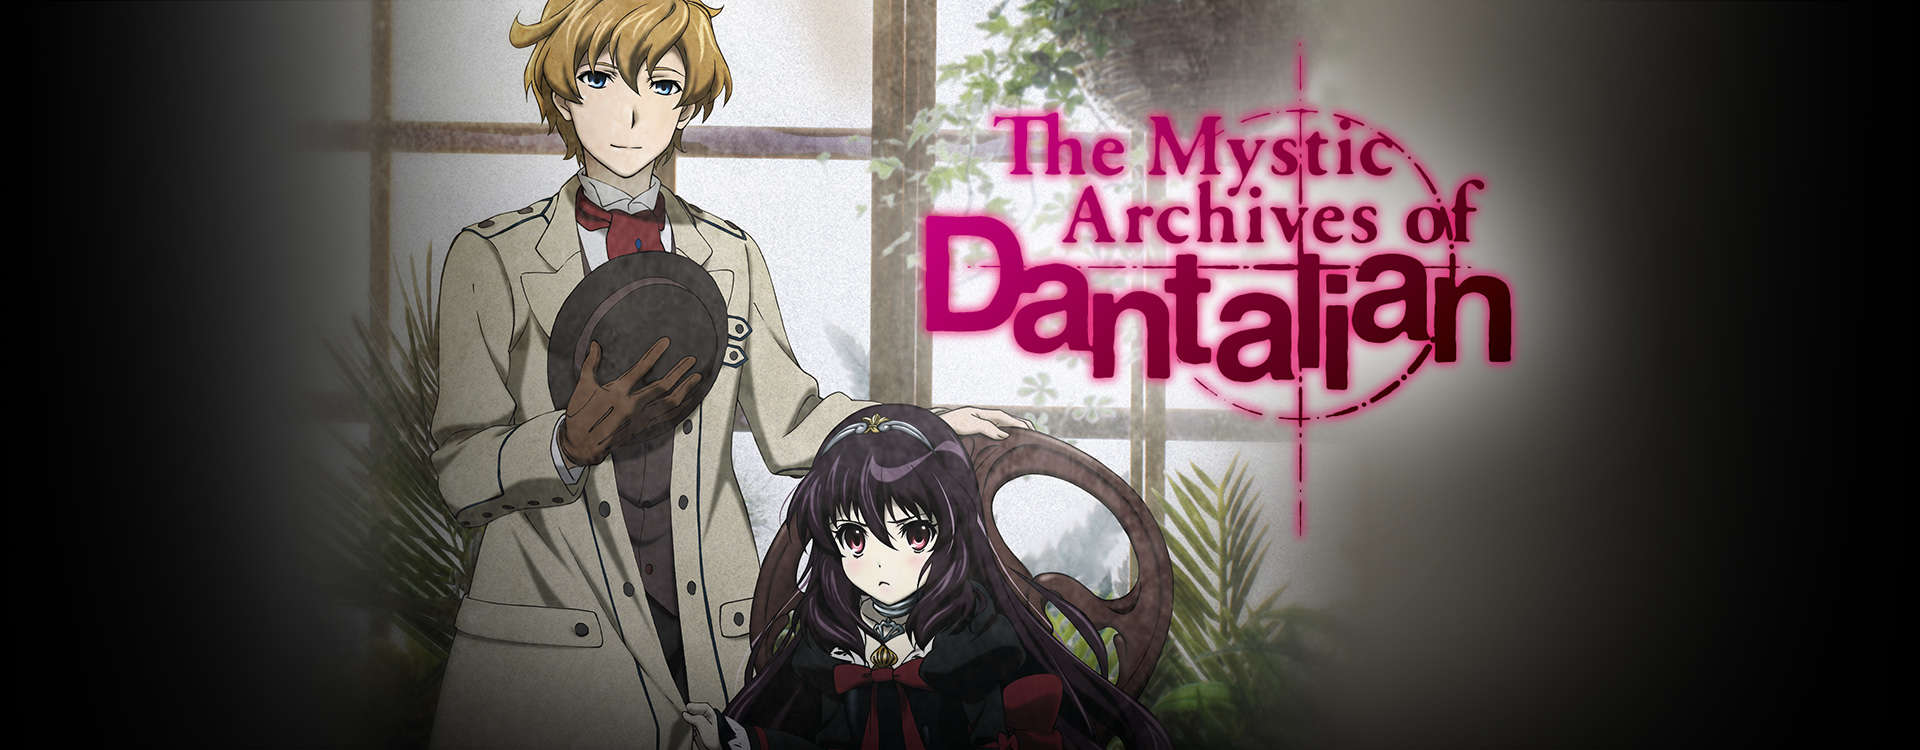 The Mystic Archives of Dantalian